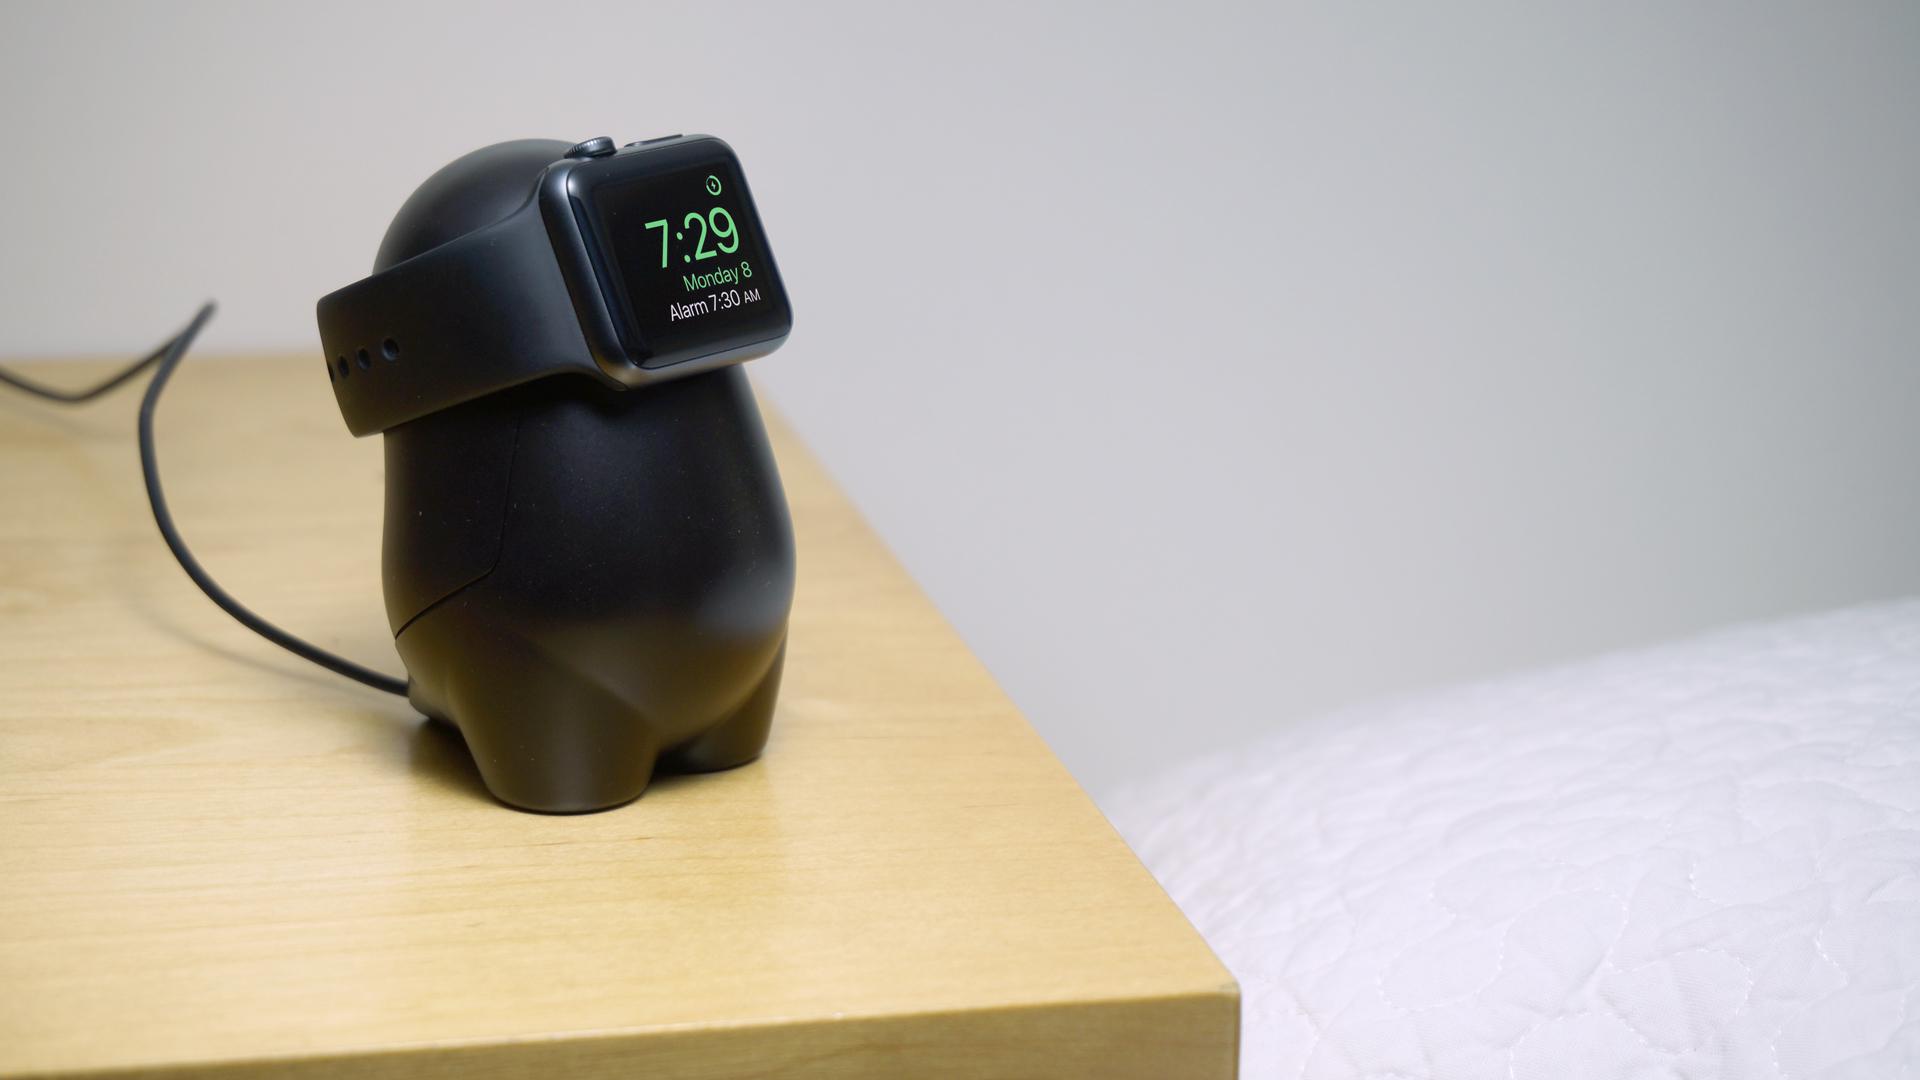 Watchme, smartwatch's companion